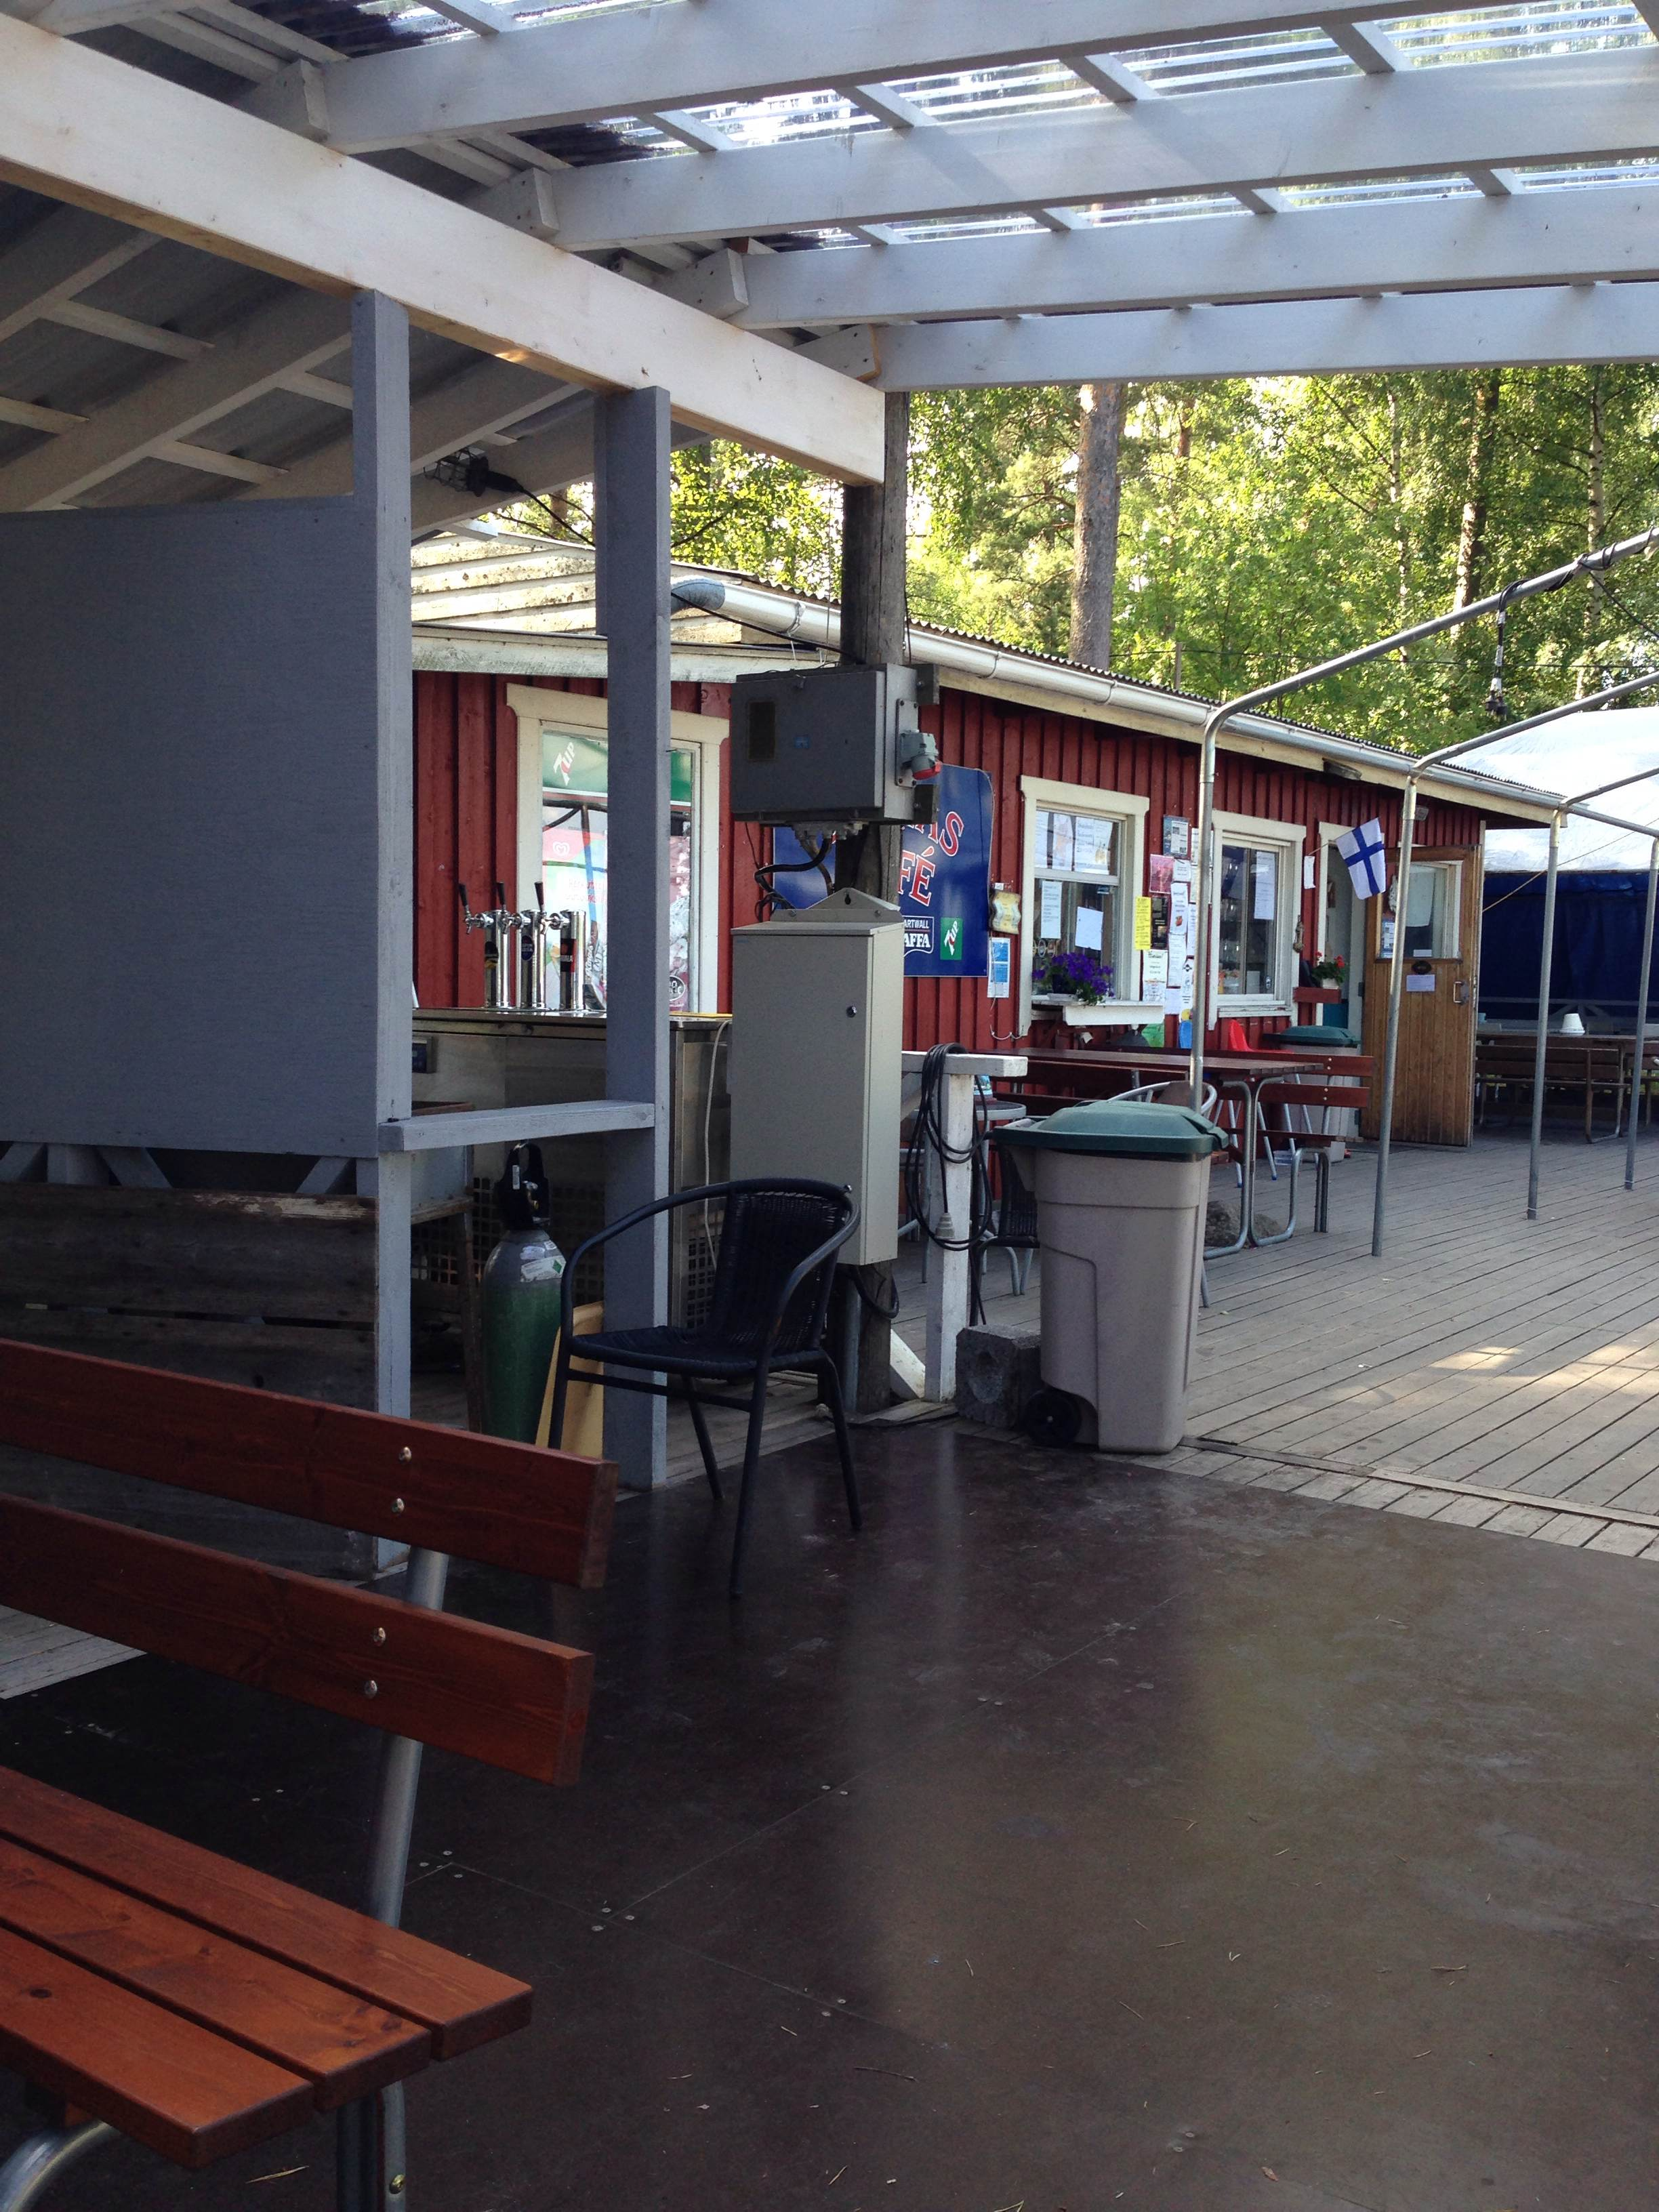 Benitas Café, Pellinki